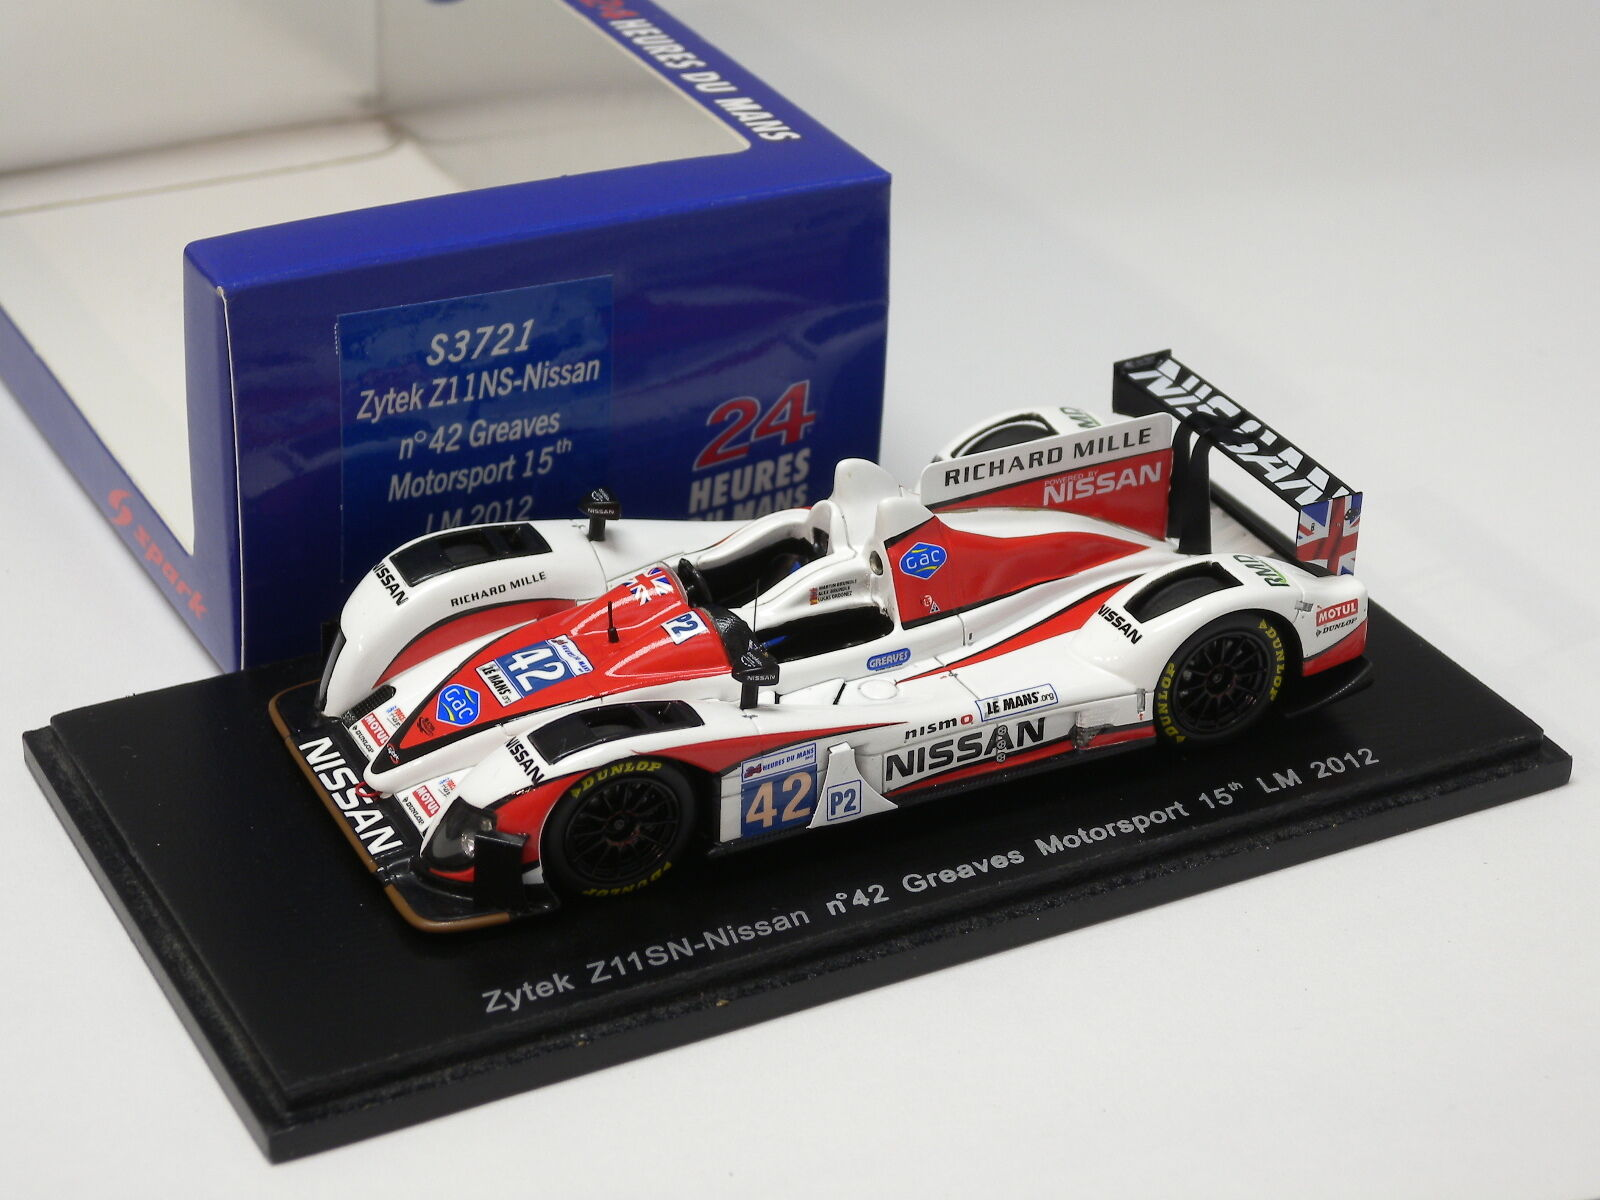 compra limitada Zytek Z11NS-Nissan, No.42, Greaves Motosport, Le Mans 2012 Spark Spark Spark 1 43 S3721  varios tamaños